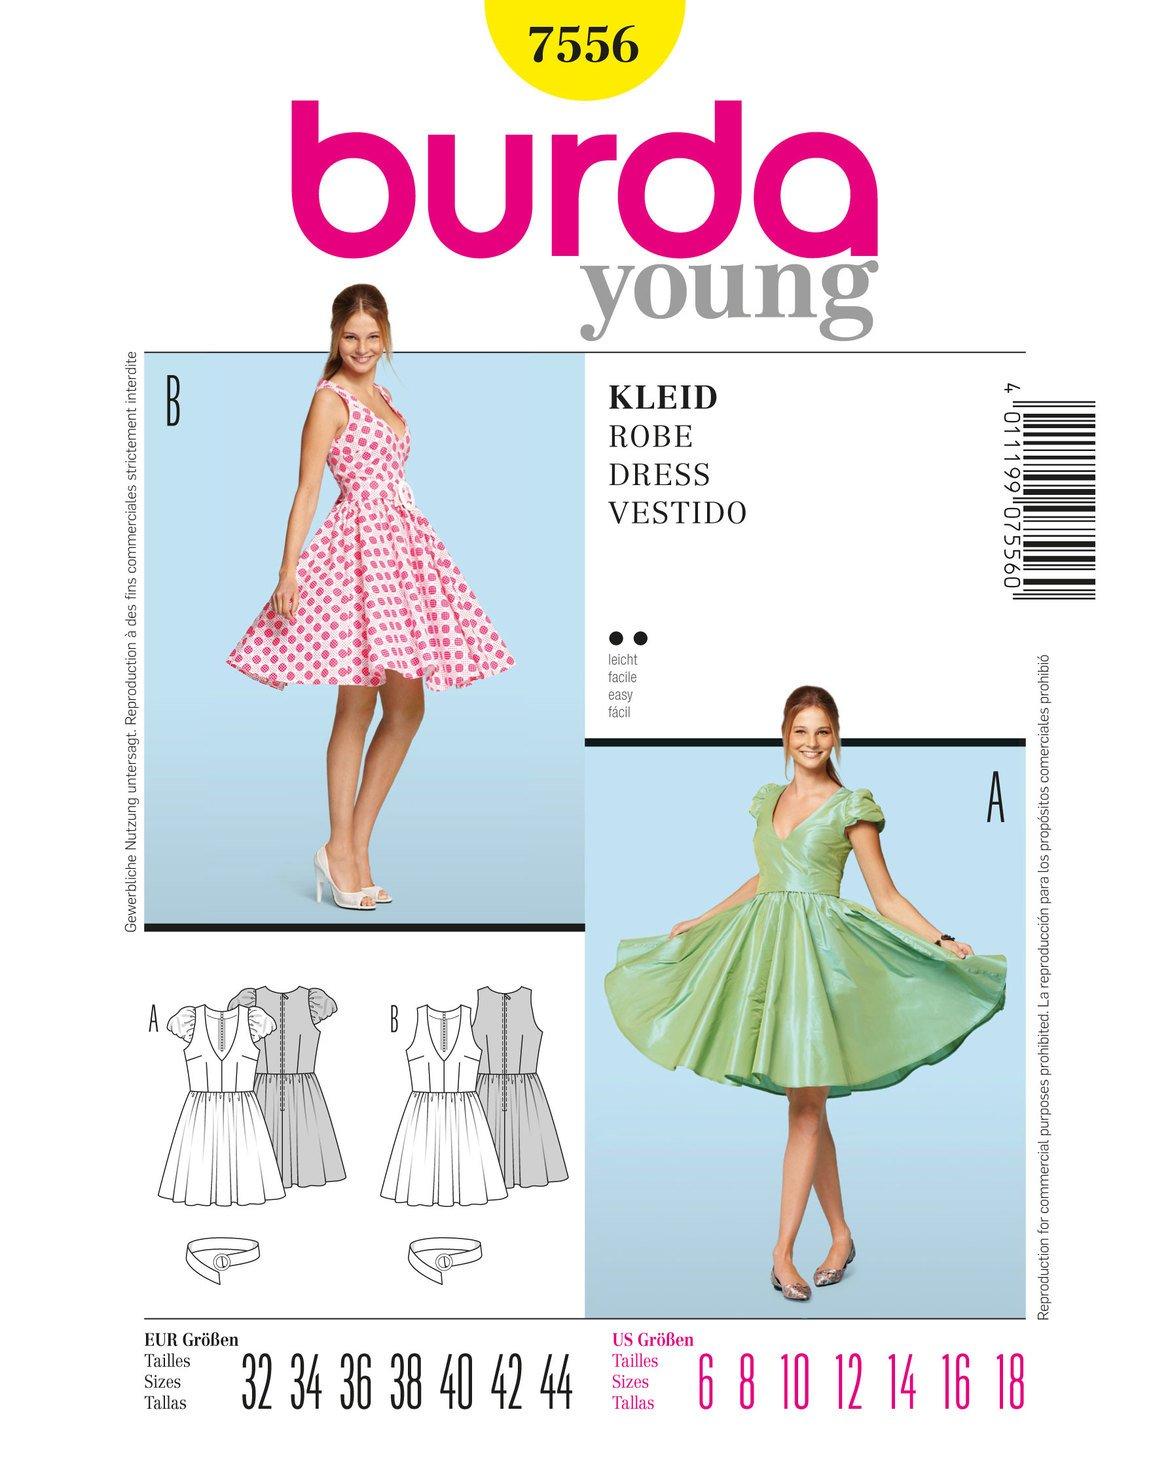 Burda Dress Sewing Patterns 7556 by Burda   B003620JDM